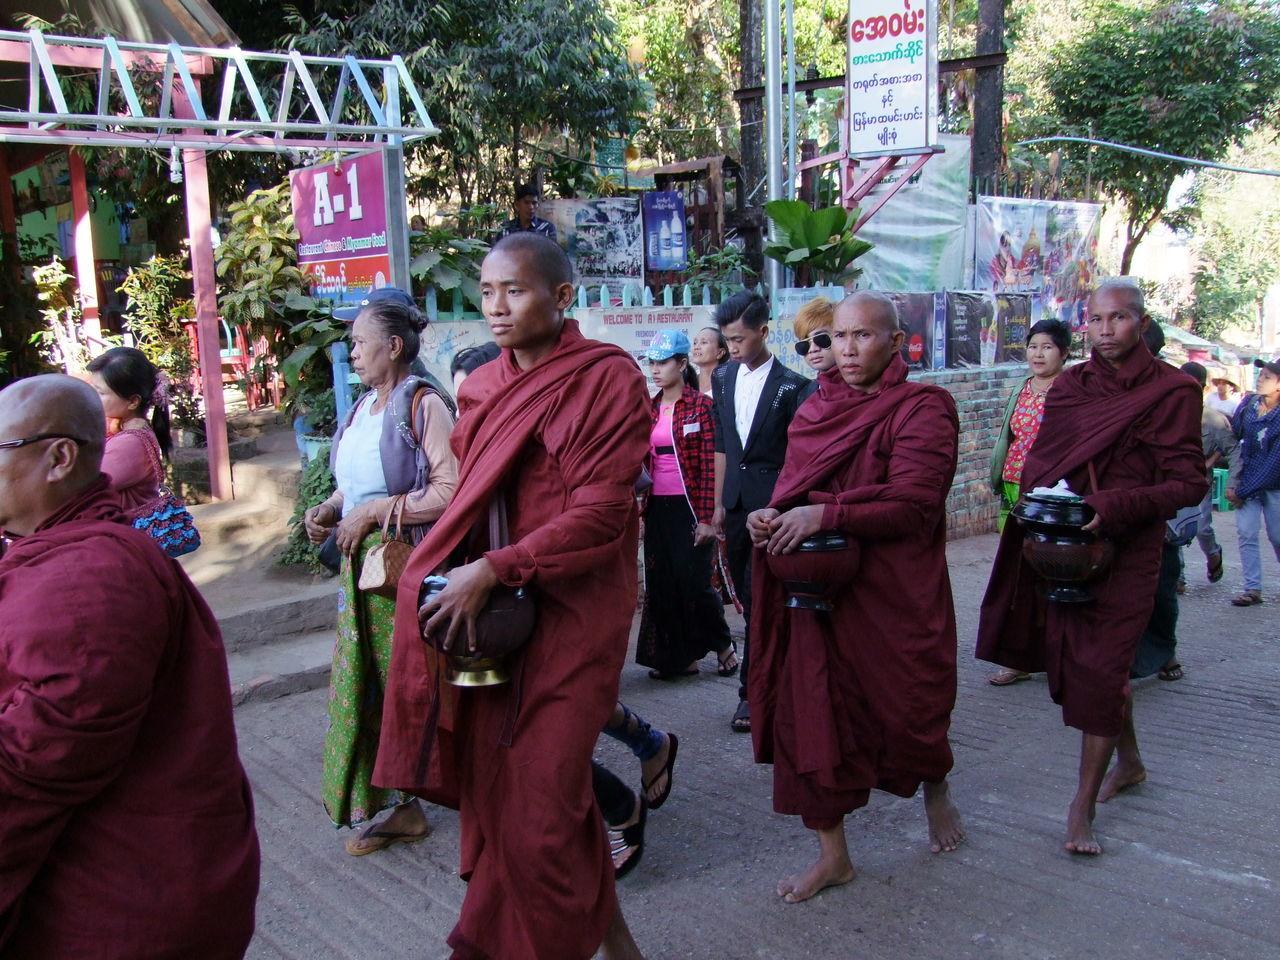 Buddhist Monks & Pilgrims at Mount Kyaiktiyo (Golden Rock) Buddhism Buddhist Culture Buddhist Monks Group Of People Kinpun Men Monks Mount Kyaiktiyo Mount Kyaiktiyo Pagoda Myanmar Sunlight And Shade Walking